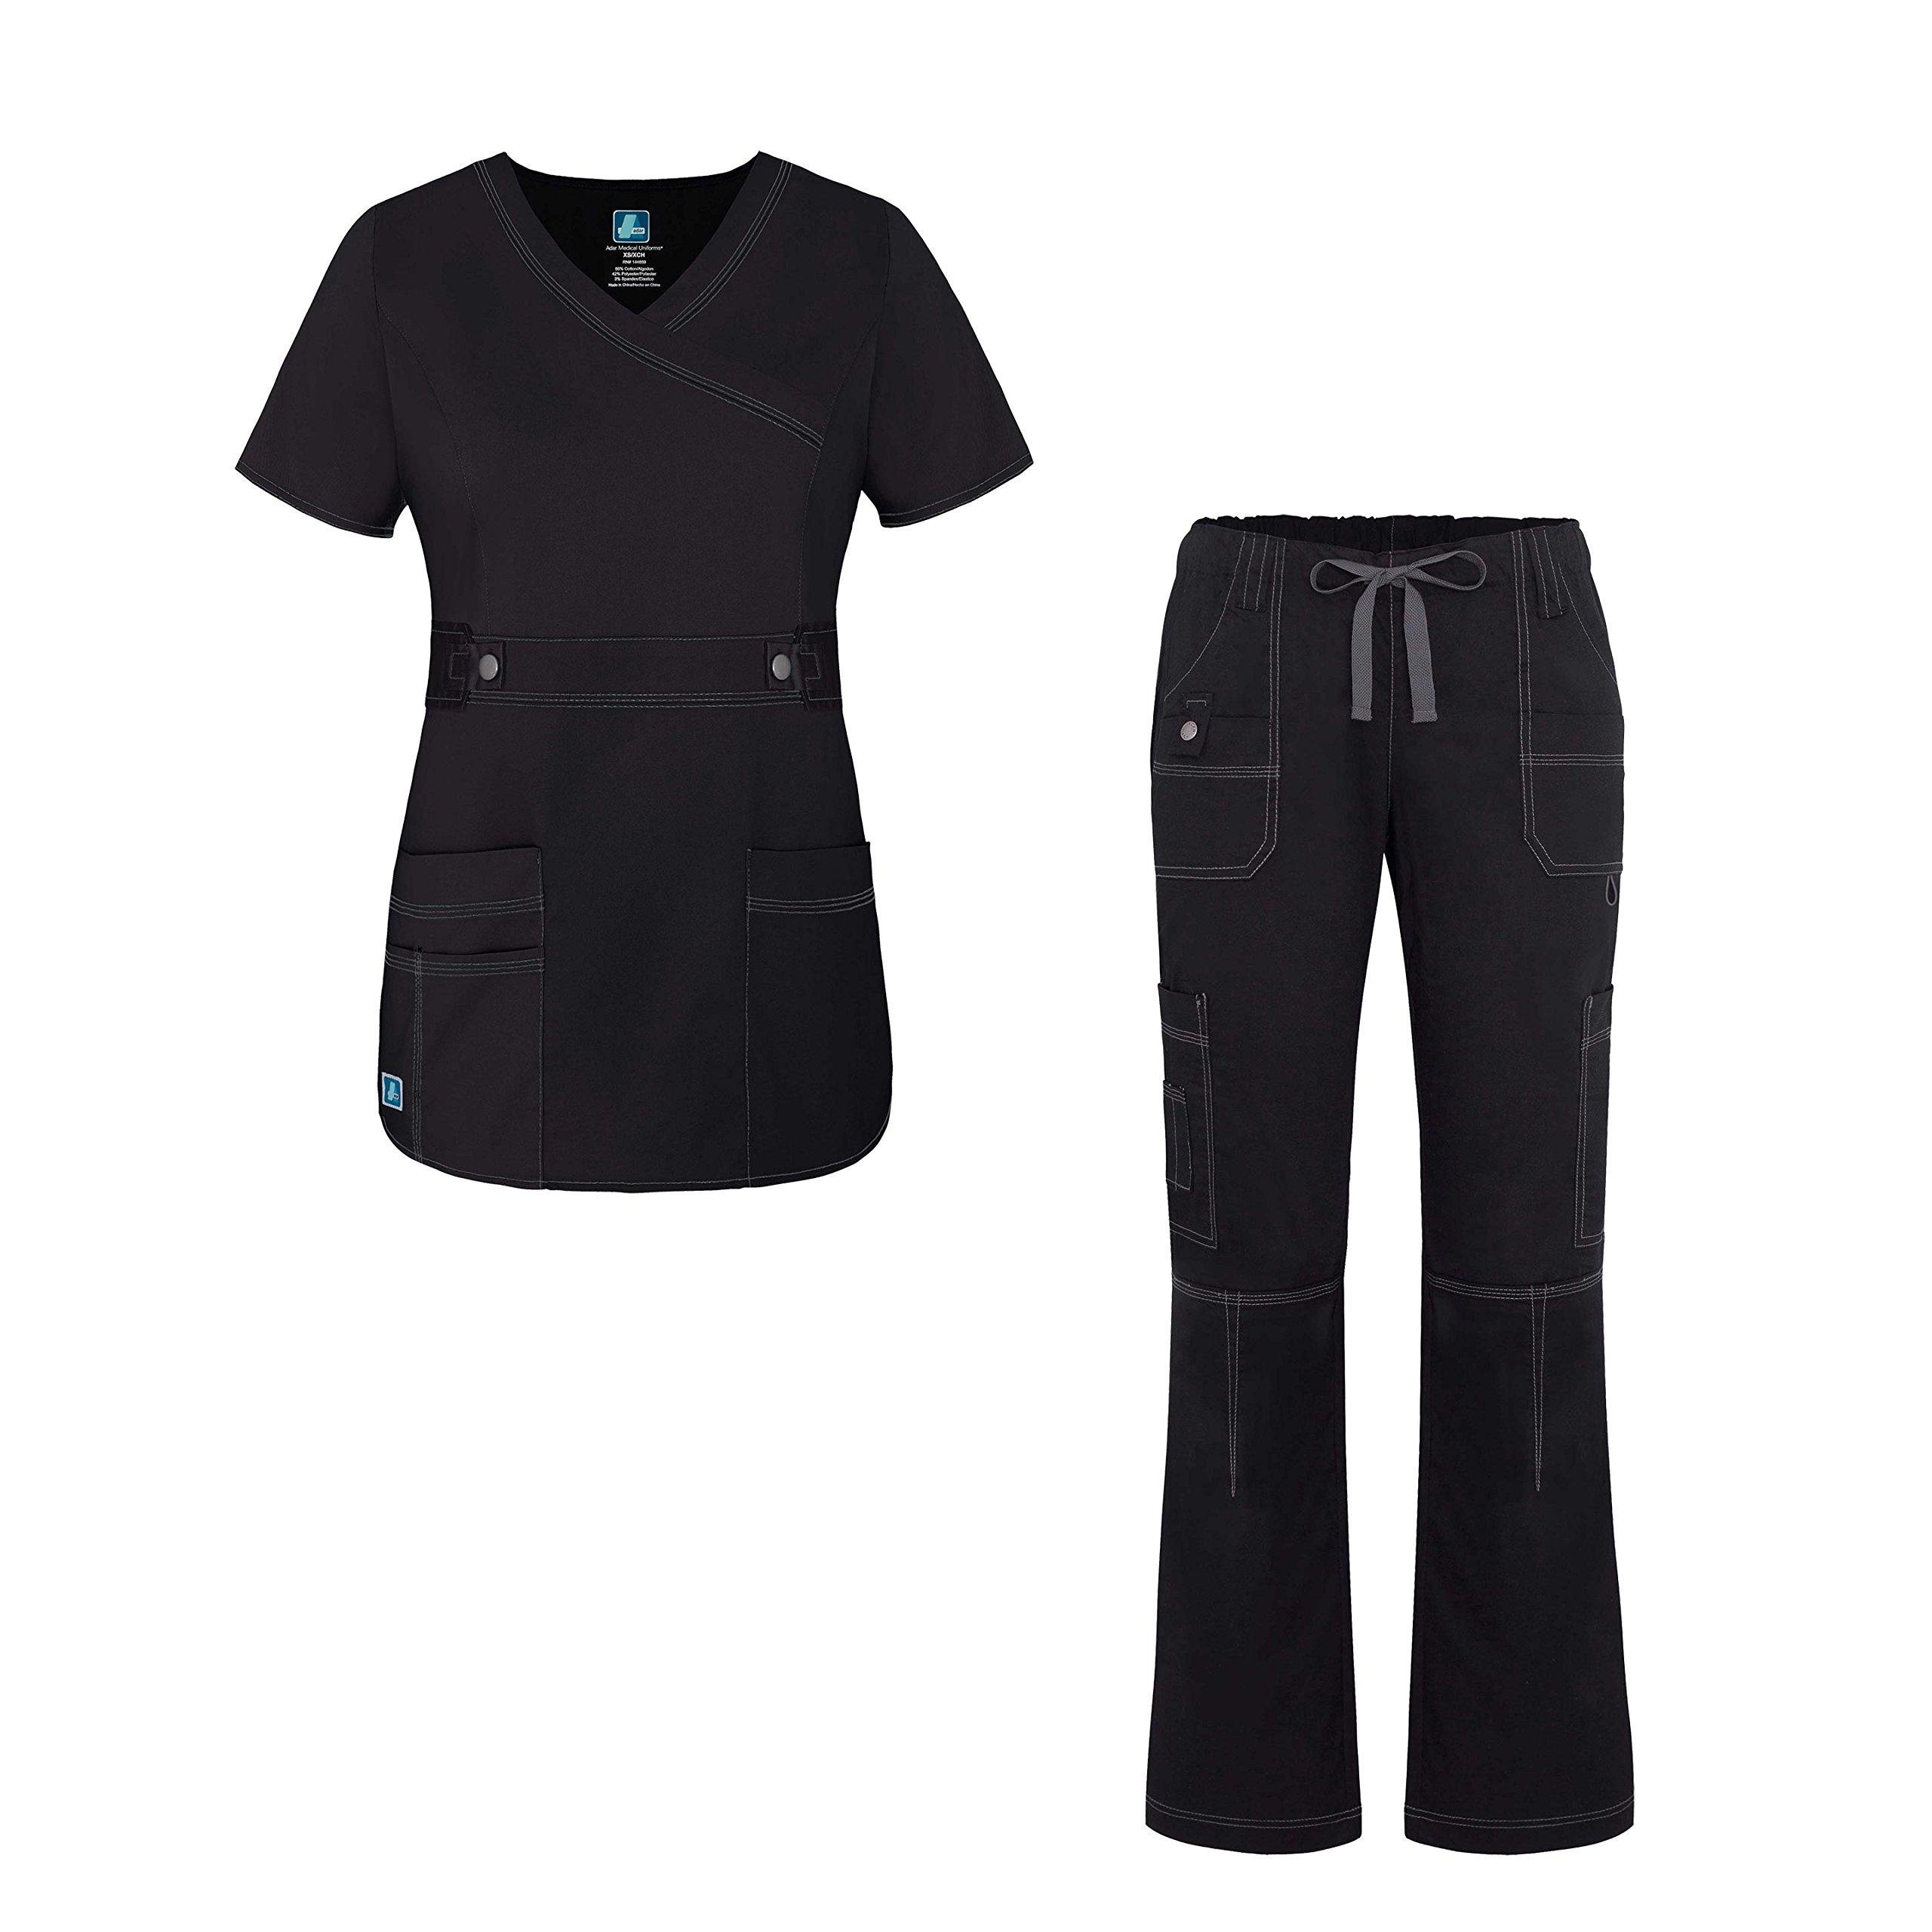 Adar Pop-Stretch Junior Fit Women's Scrub Set - Crossover Top and Multi Pocket Pants - 3500 - Black - XXS